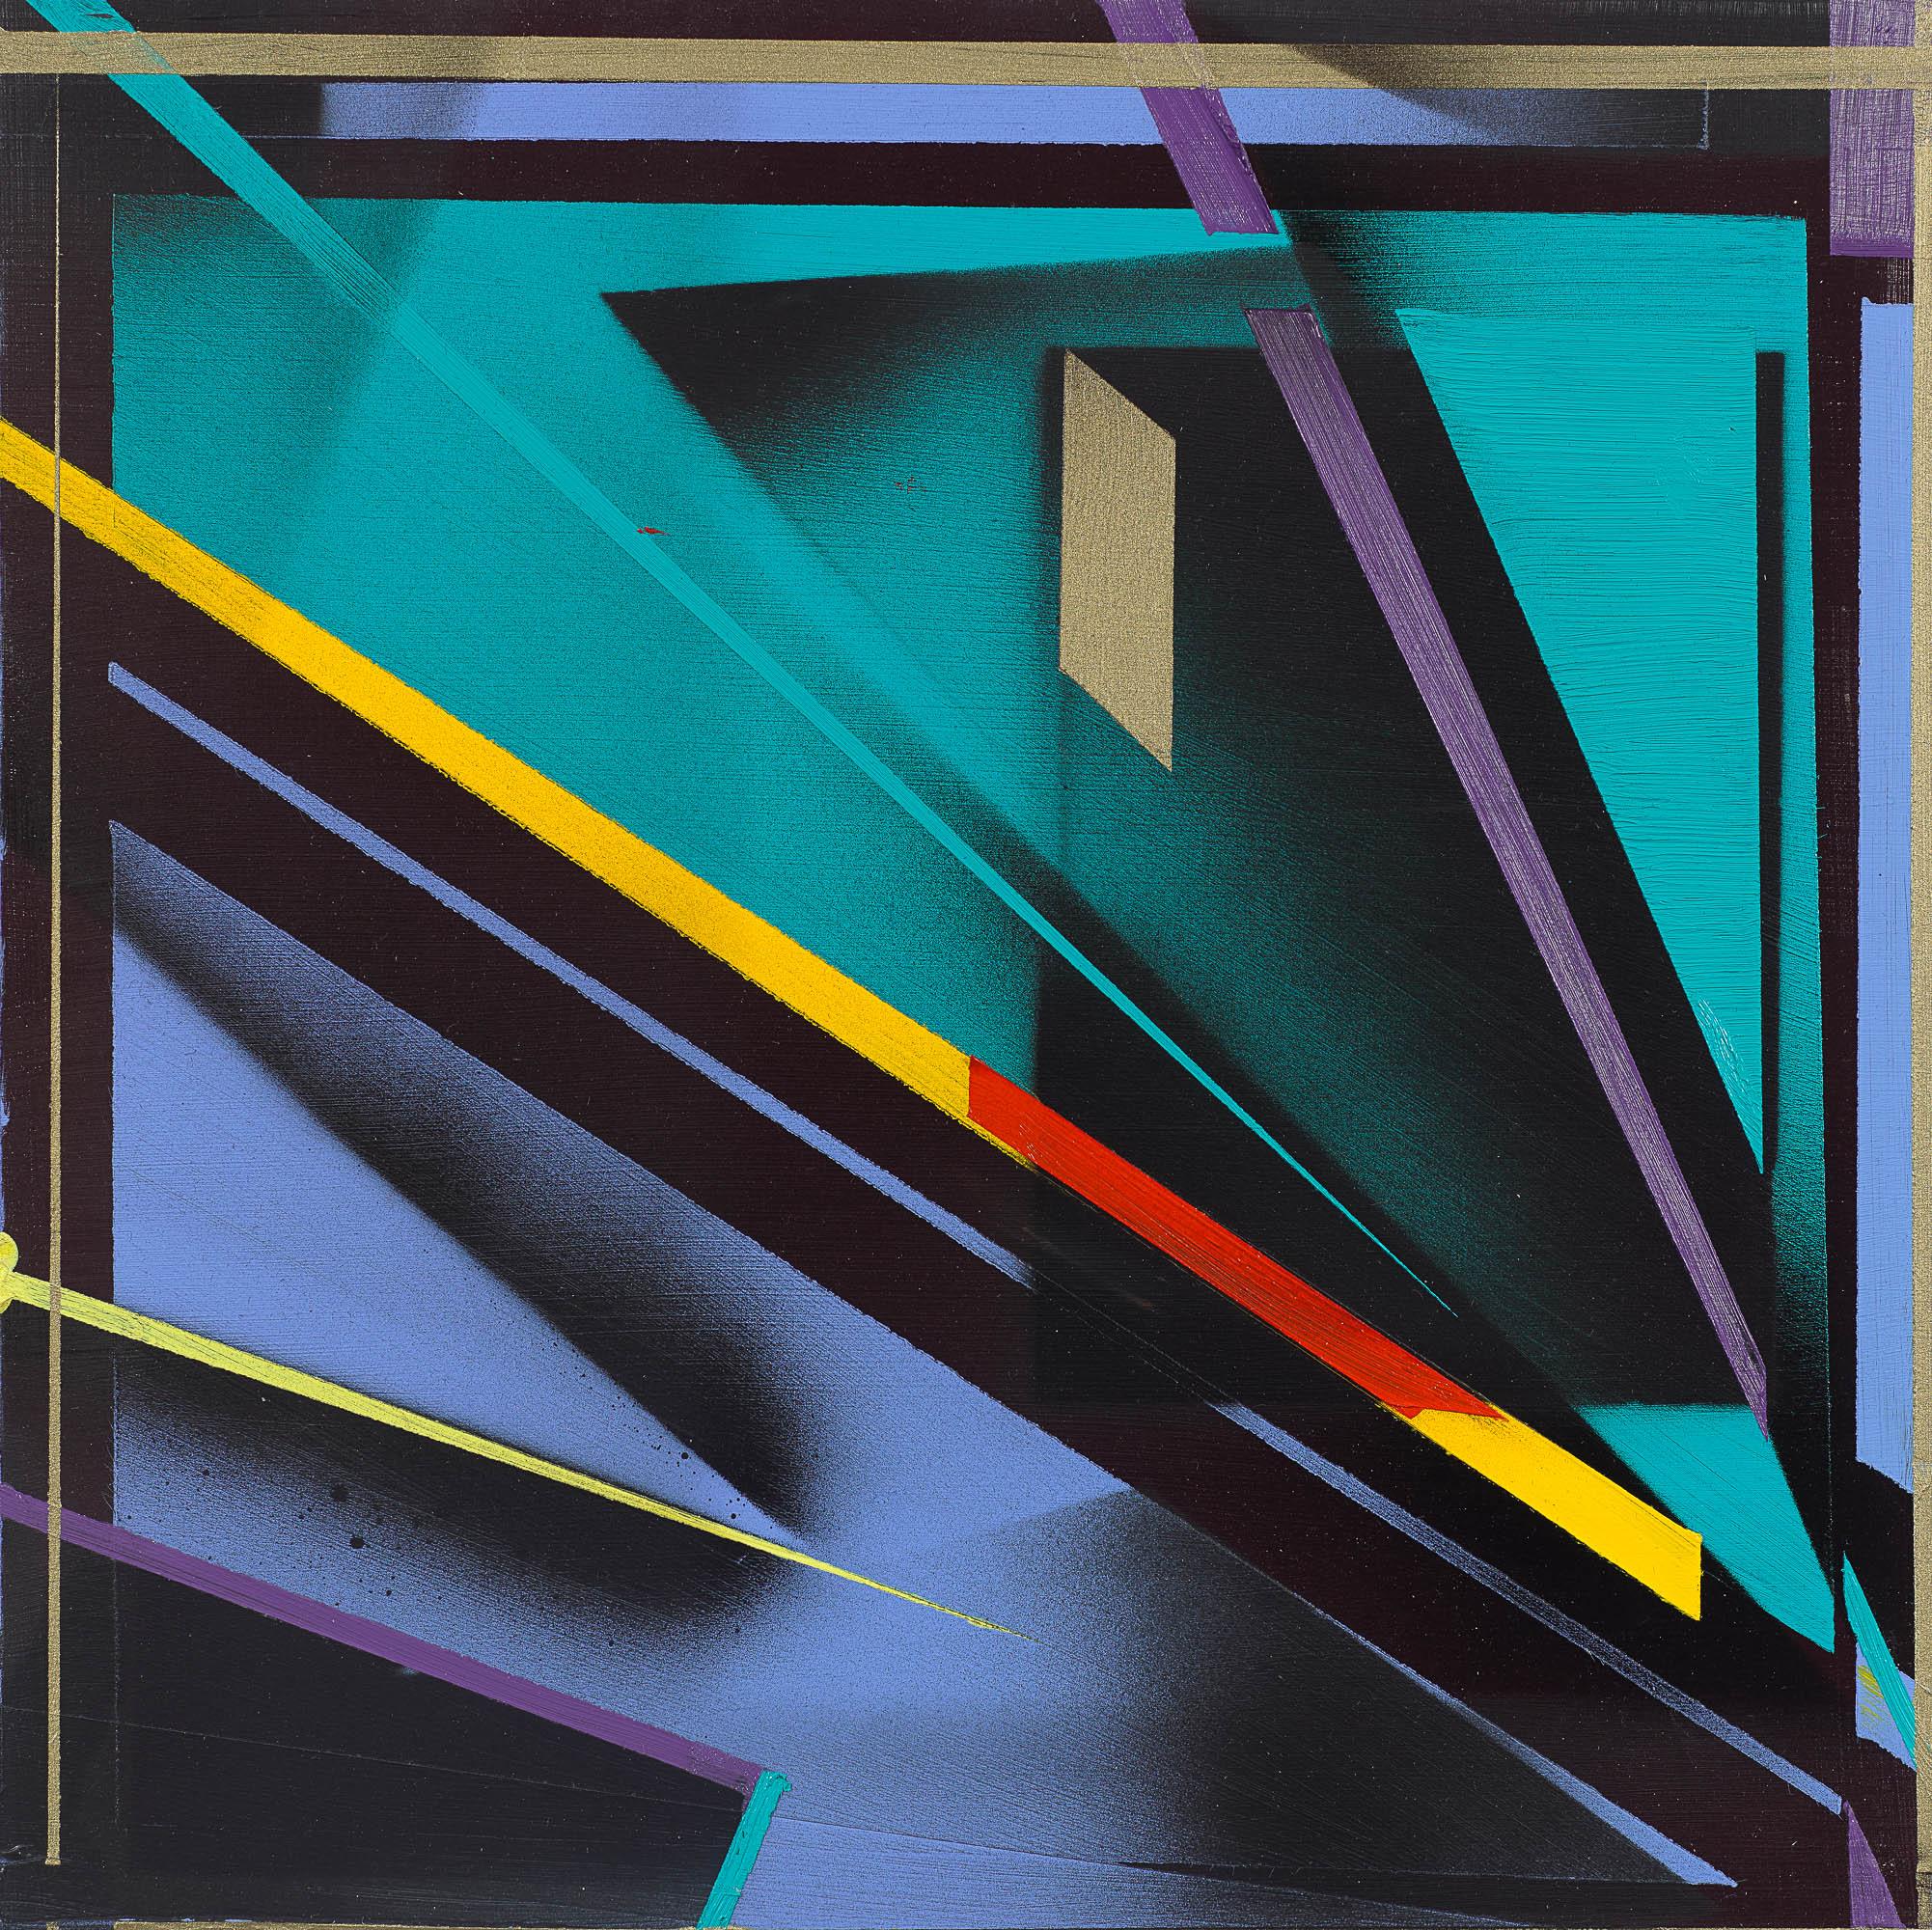 "Yellow Zip by Nola Zirin, 12x12"" mixed media, photo from OTA Contemporary"